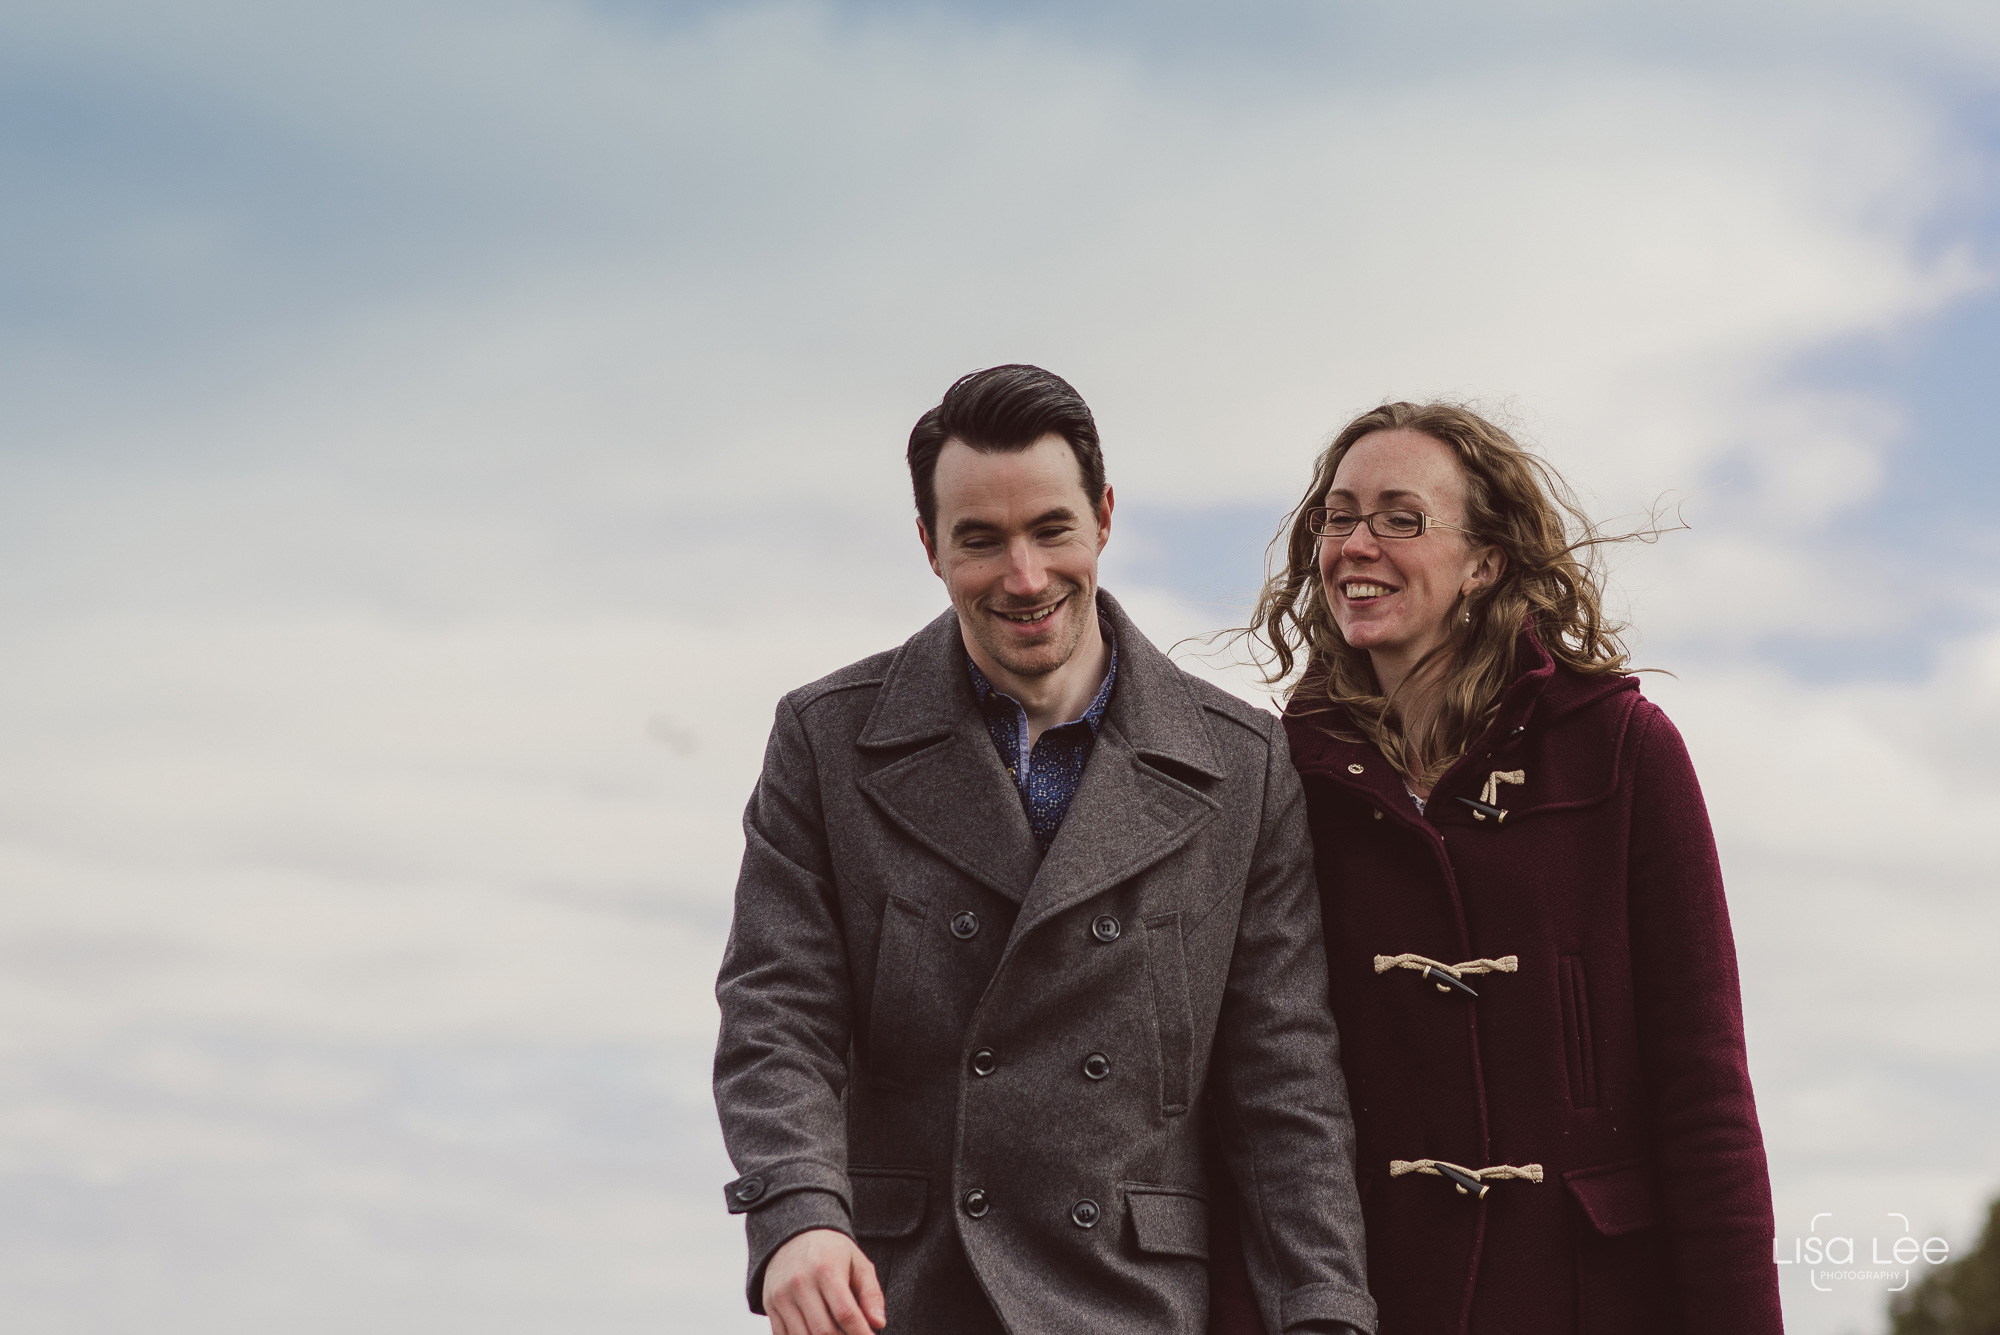 christchurch-wedding-photography-pre-shoot-hengistbury-head-dorset.jpg